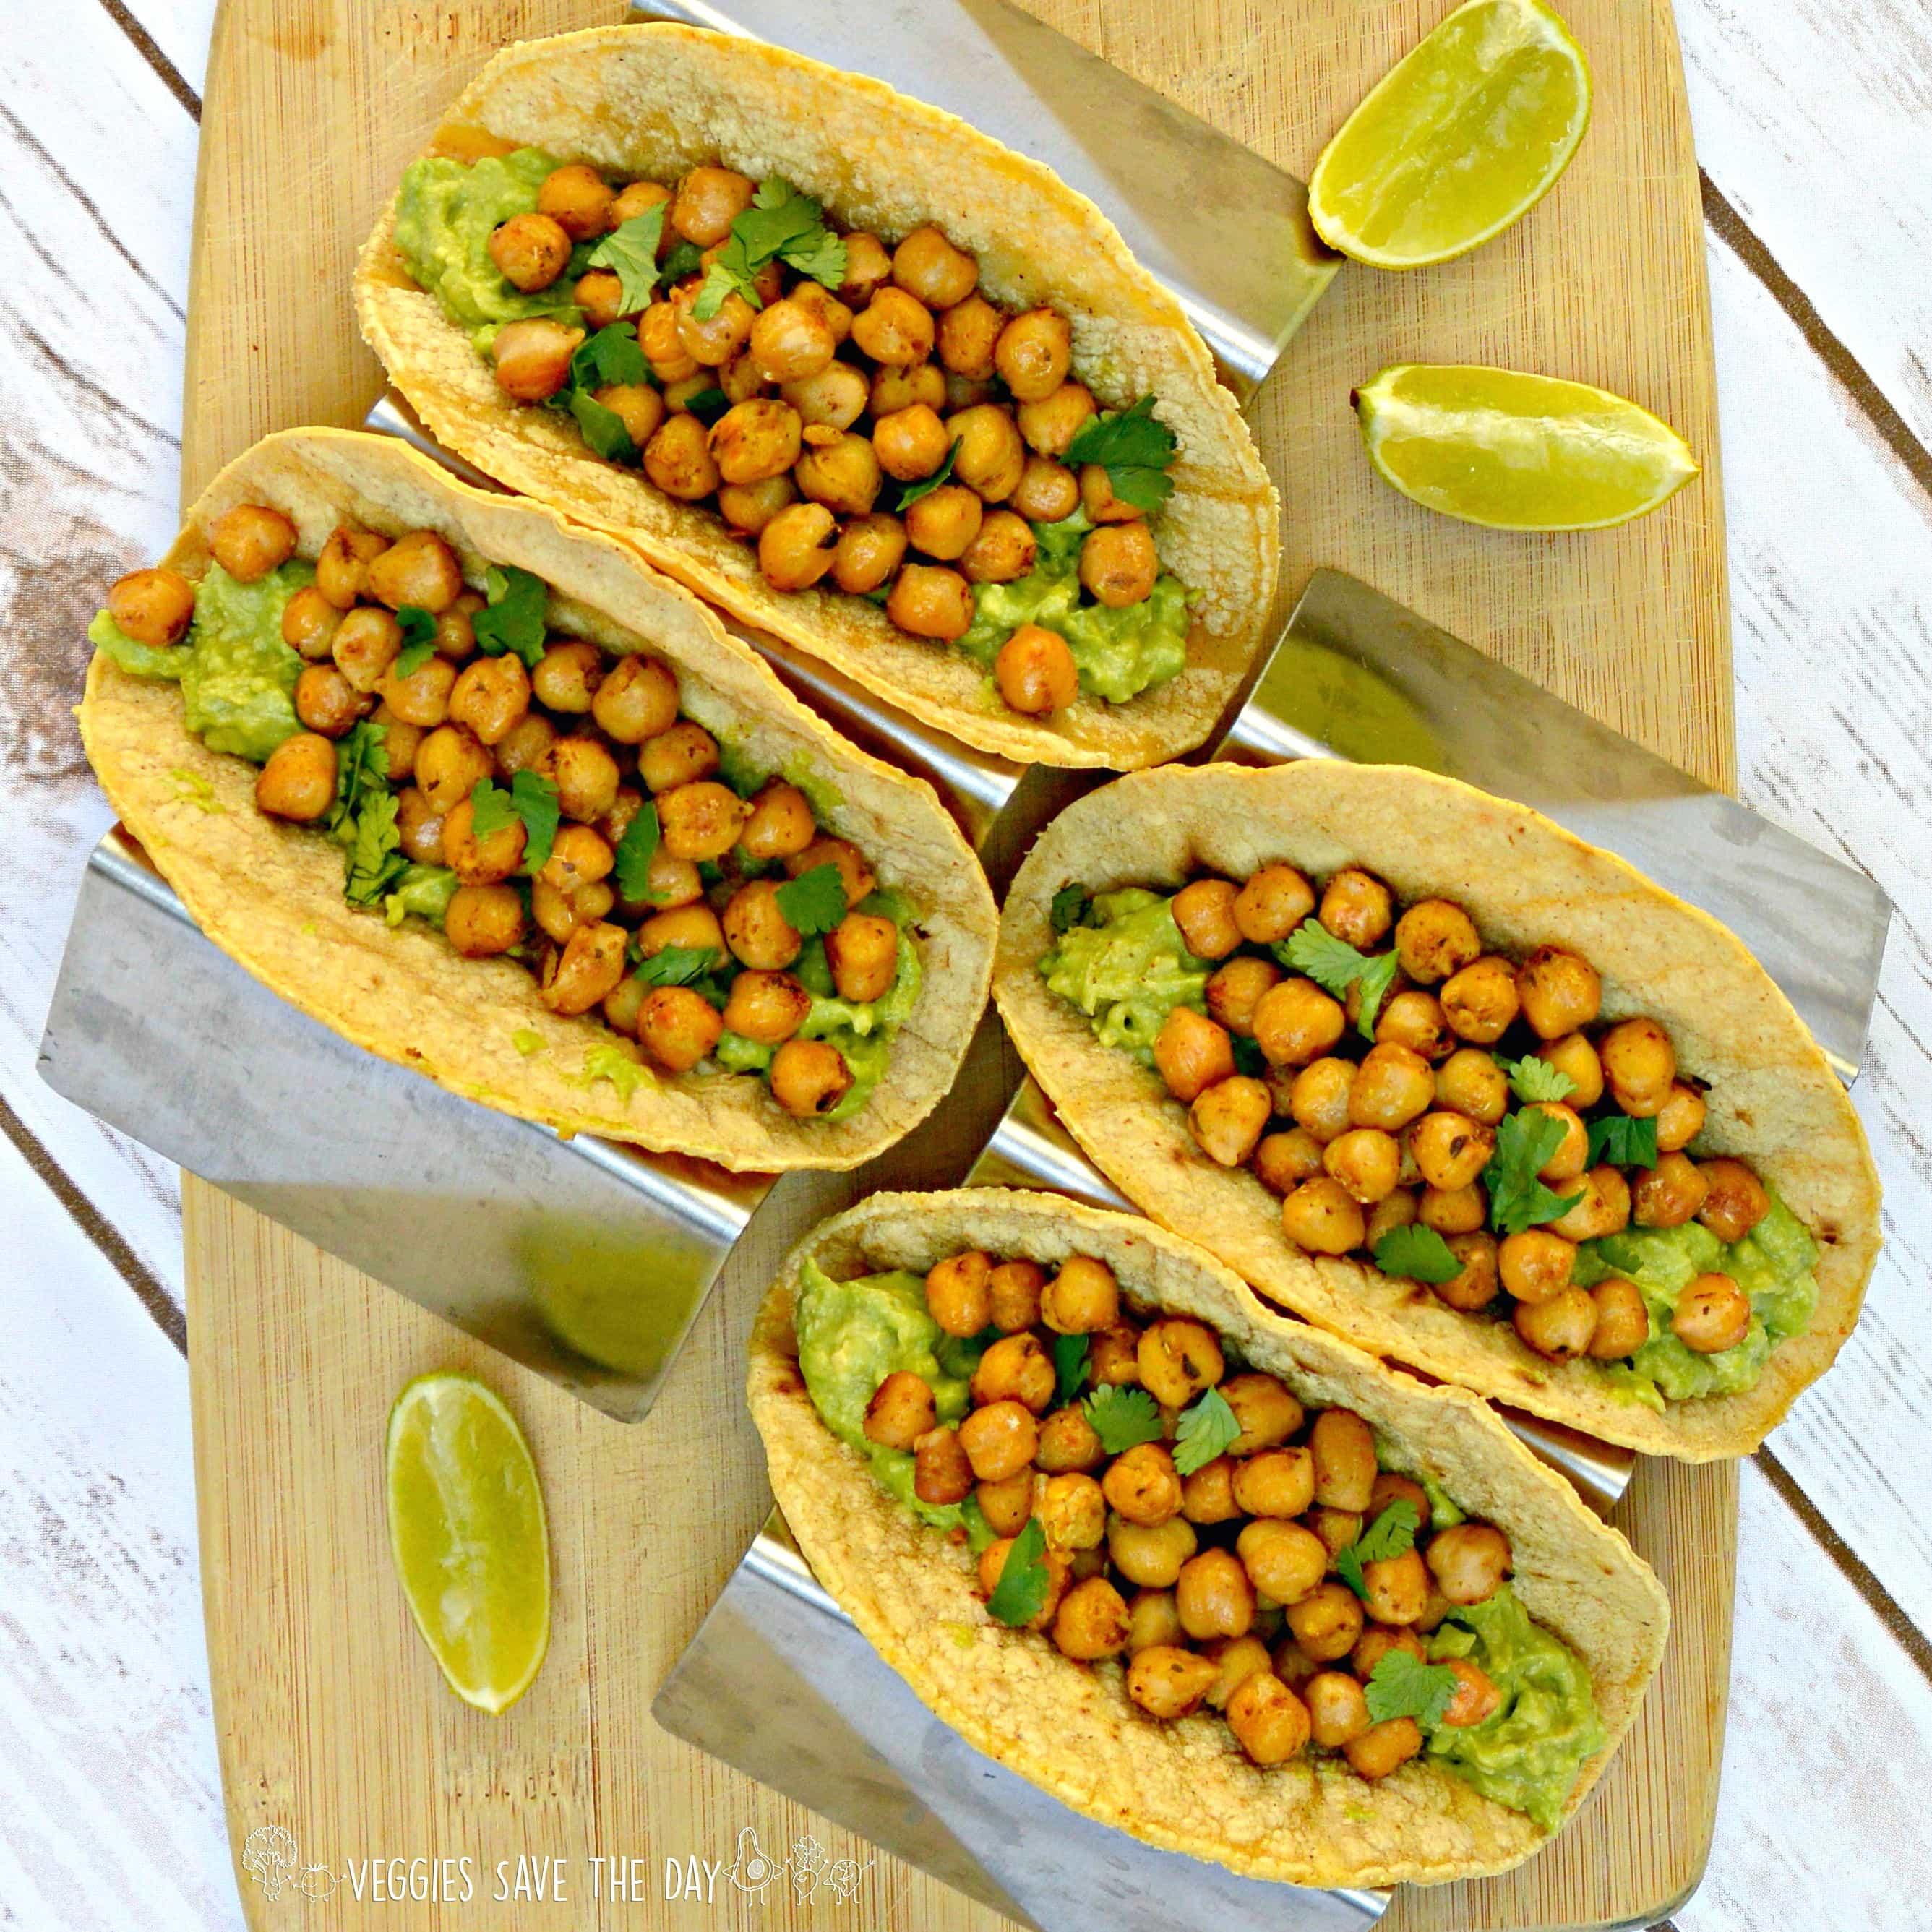 Gluten-Free Vegan Recipes chickpea and guacamole tacos